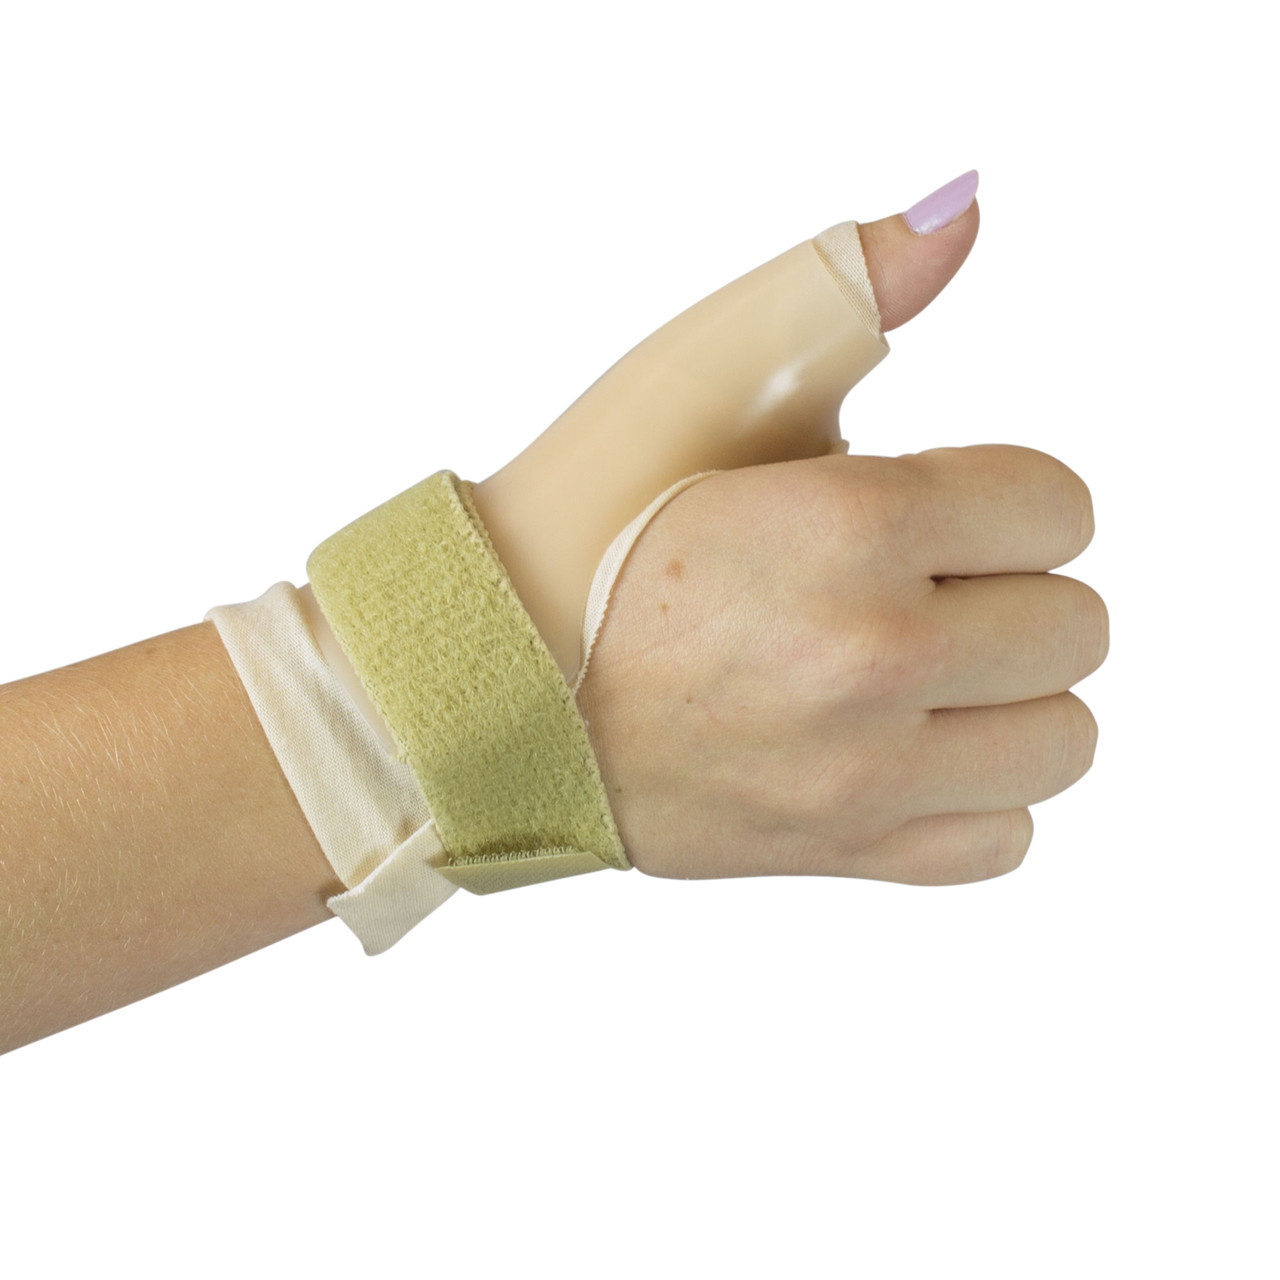 Advise you Thumb immobilization splint agree